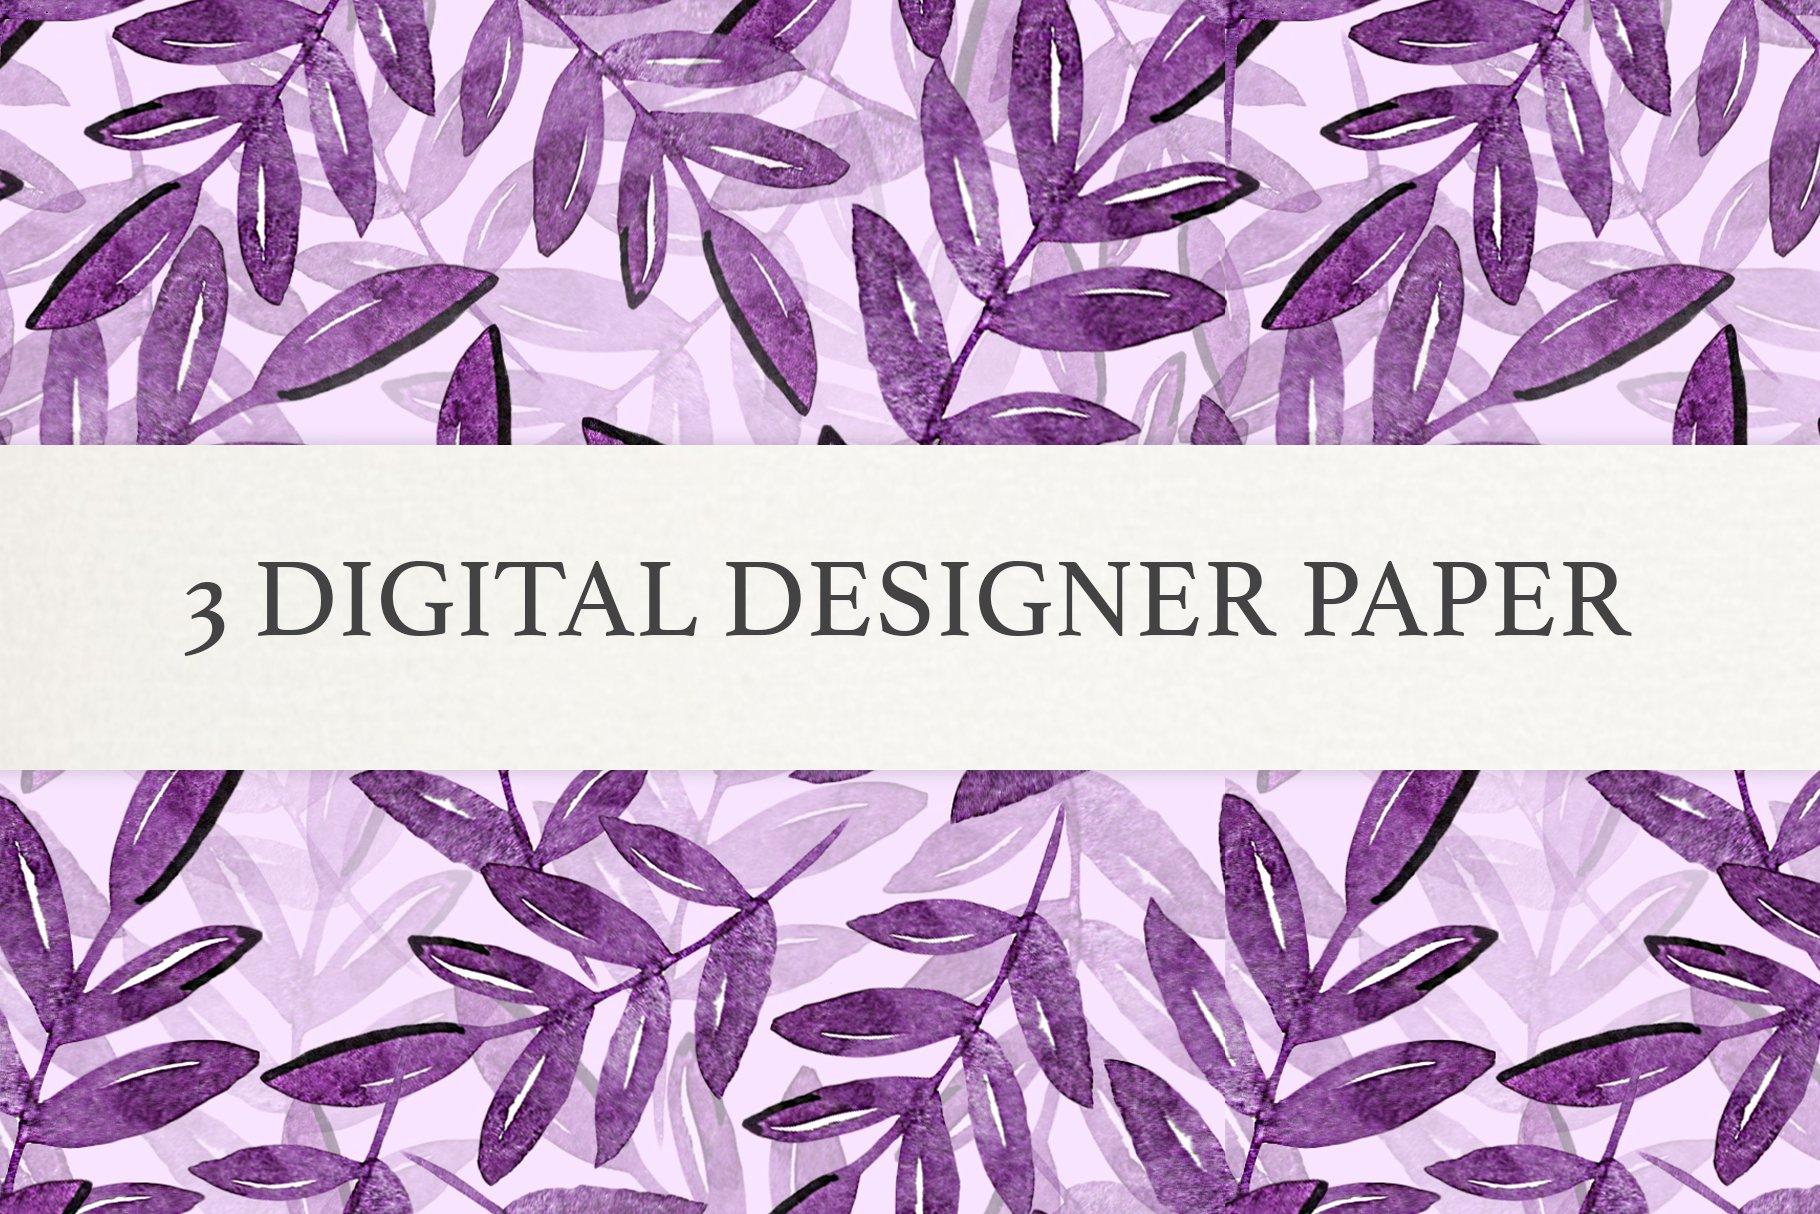 Watercolor Leaf Digital Scrapbook Paper, Seamless Patterns example image 4